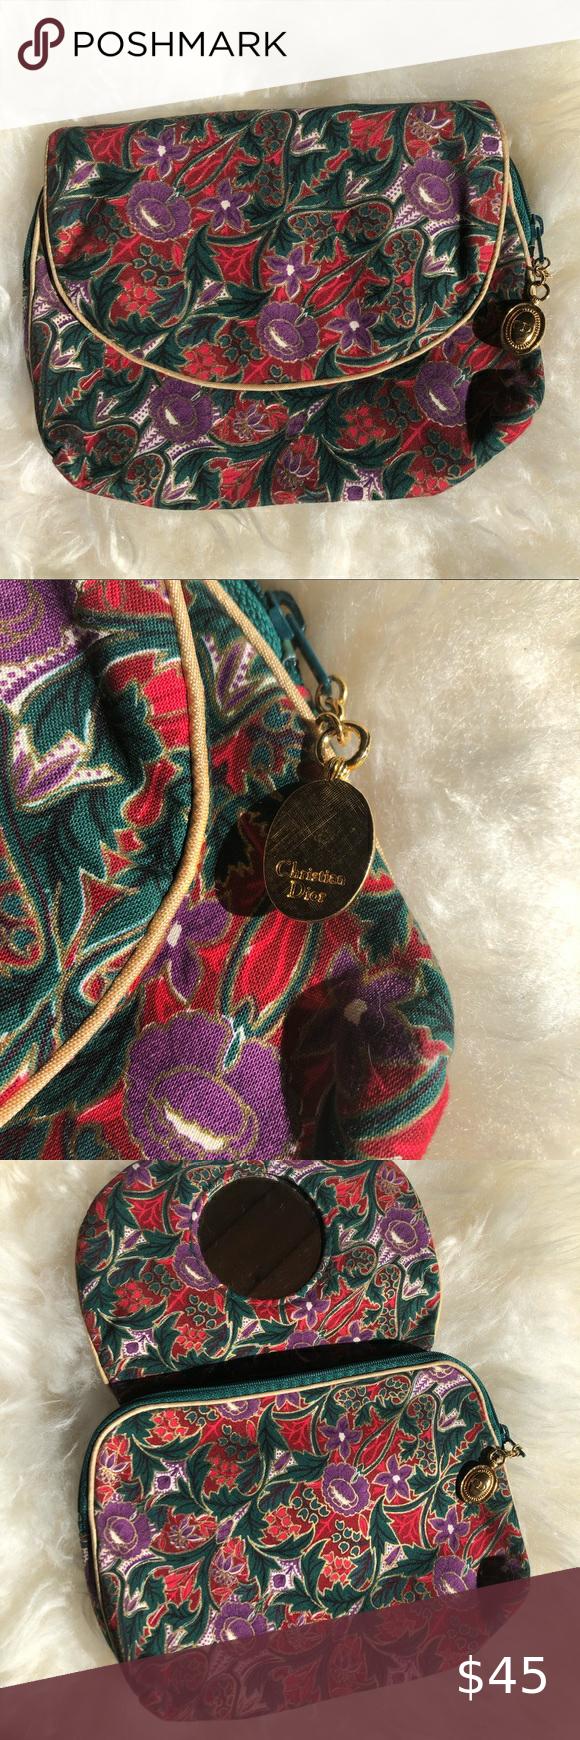 Christian Dior Vintage Cosmetic Bag Vintage cosmetic